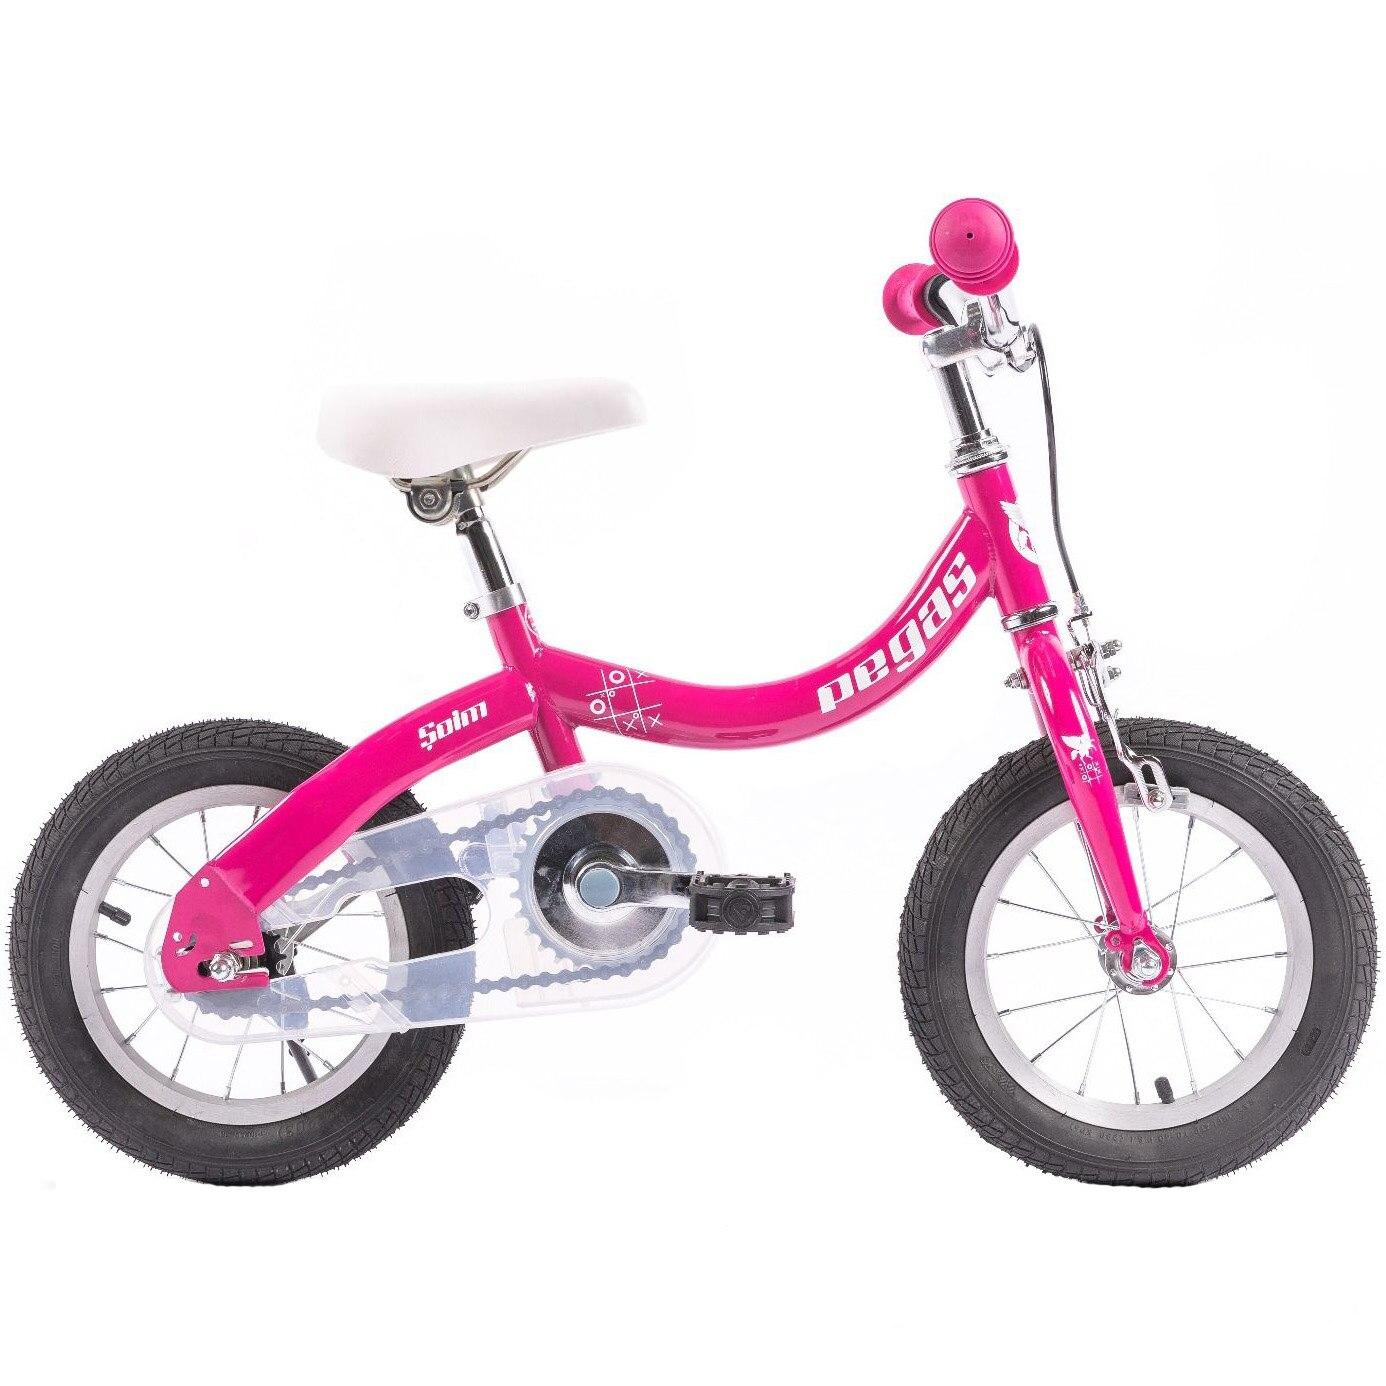 "Fotografie Bicicleta Pegas Soim EV 12"", 2in1 pentru copii, Roz"